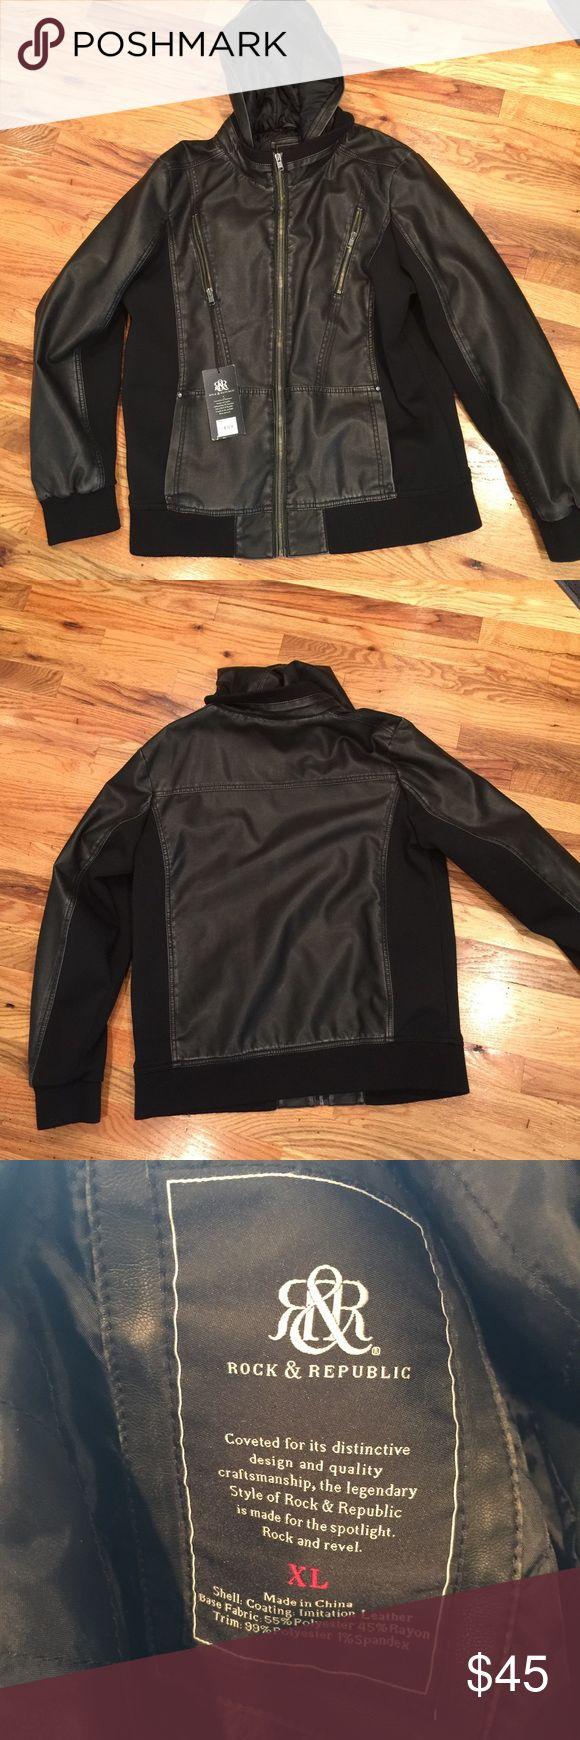 NWT Men's Rock & Republic faux leather jacket NWT Men's Rock & Republic faux leather jacket, size XL Rock & Republic Jackets & Coats Bomber & Varsity